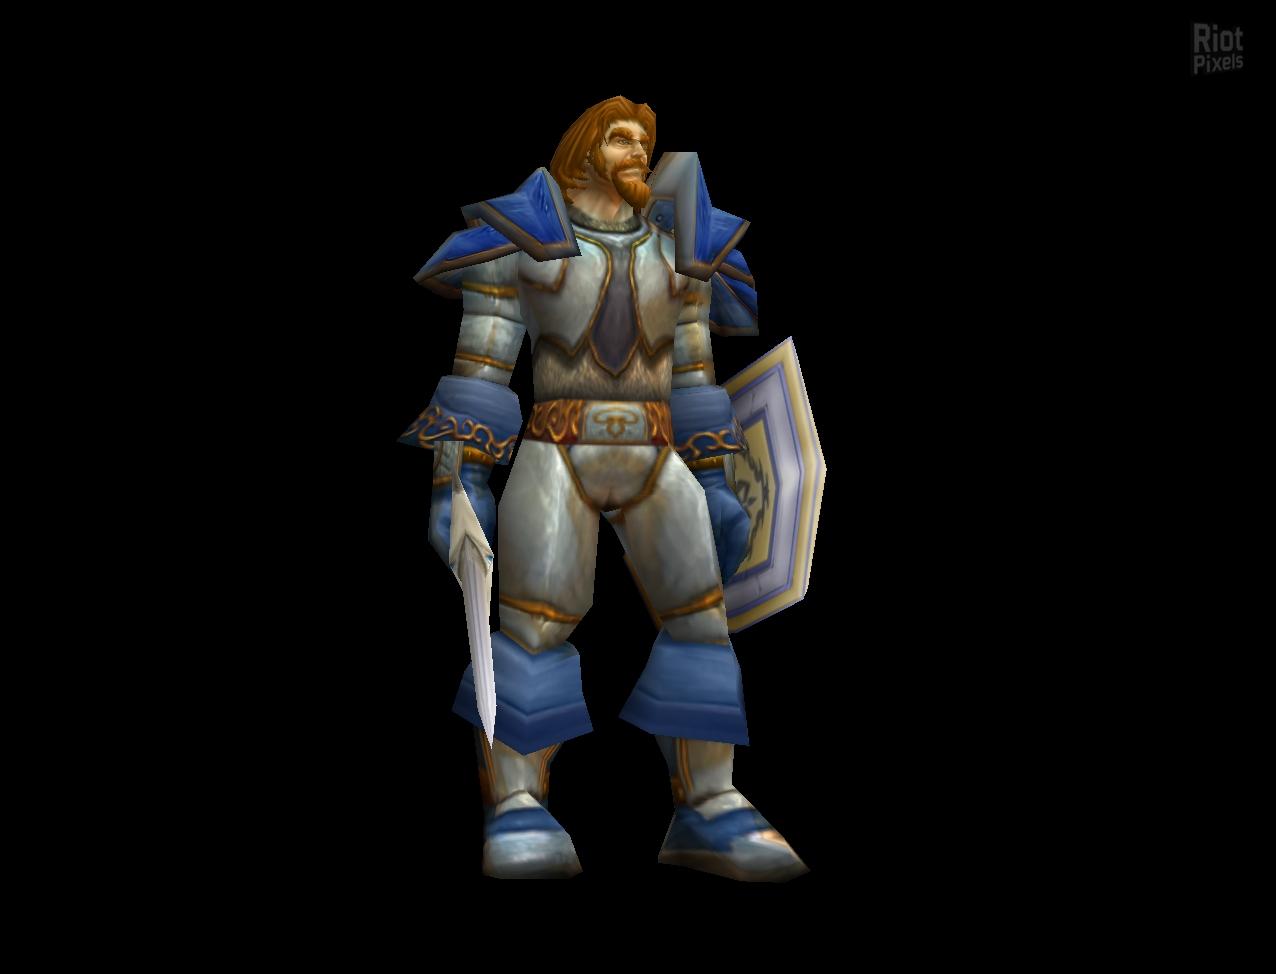 Warcraft human nude movies